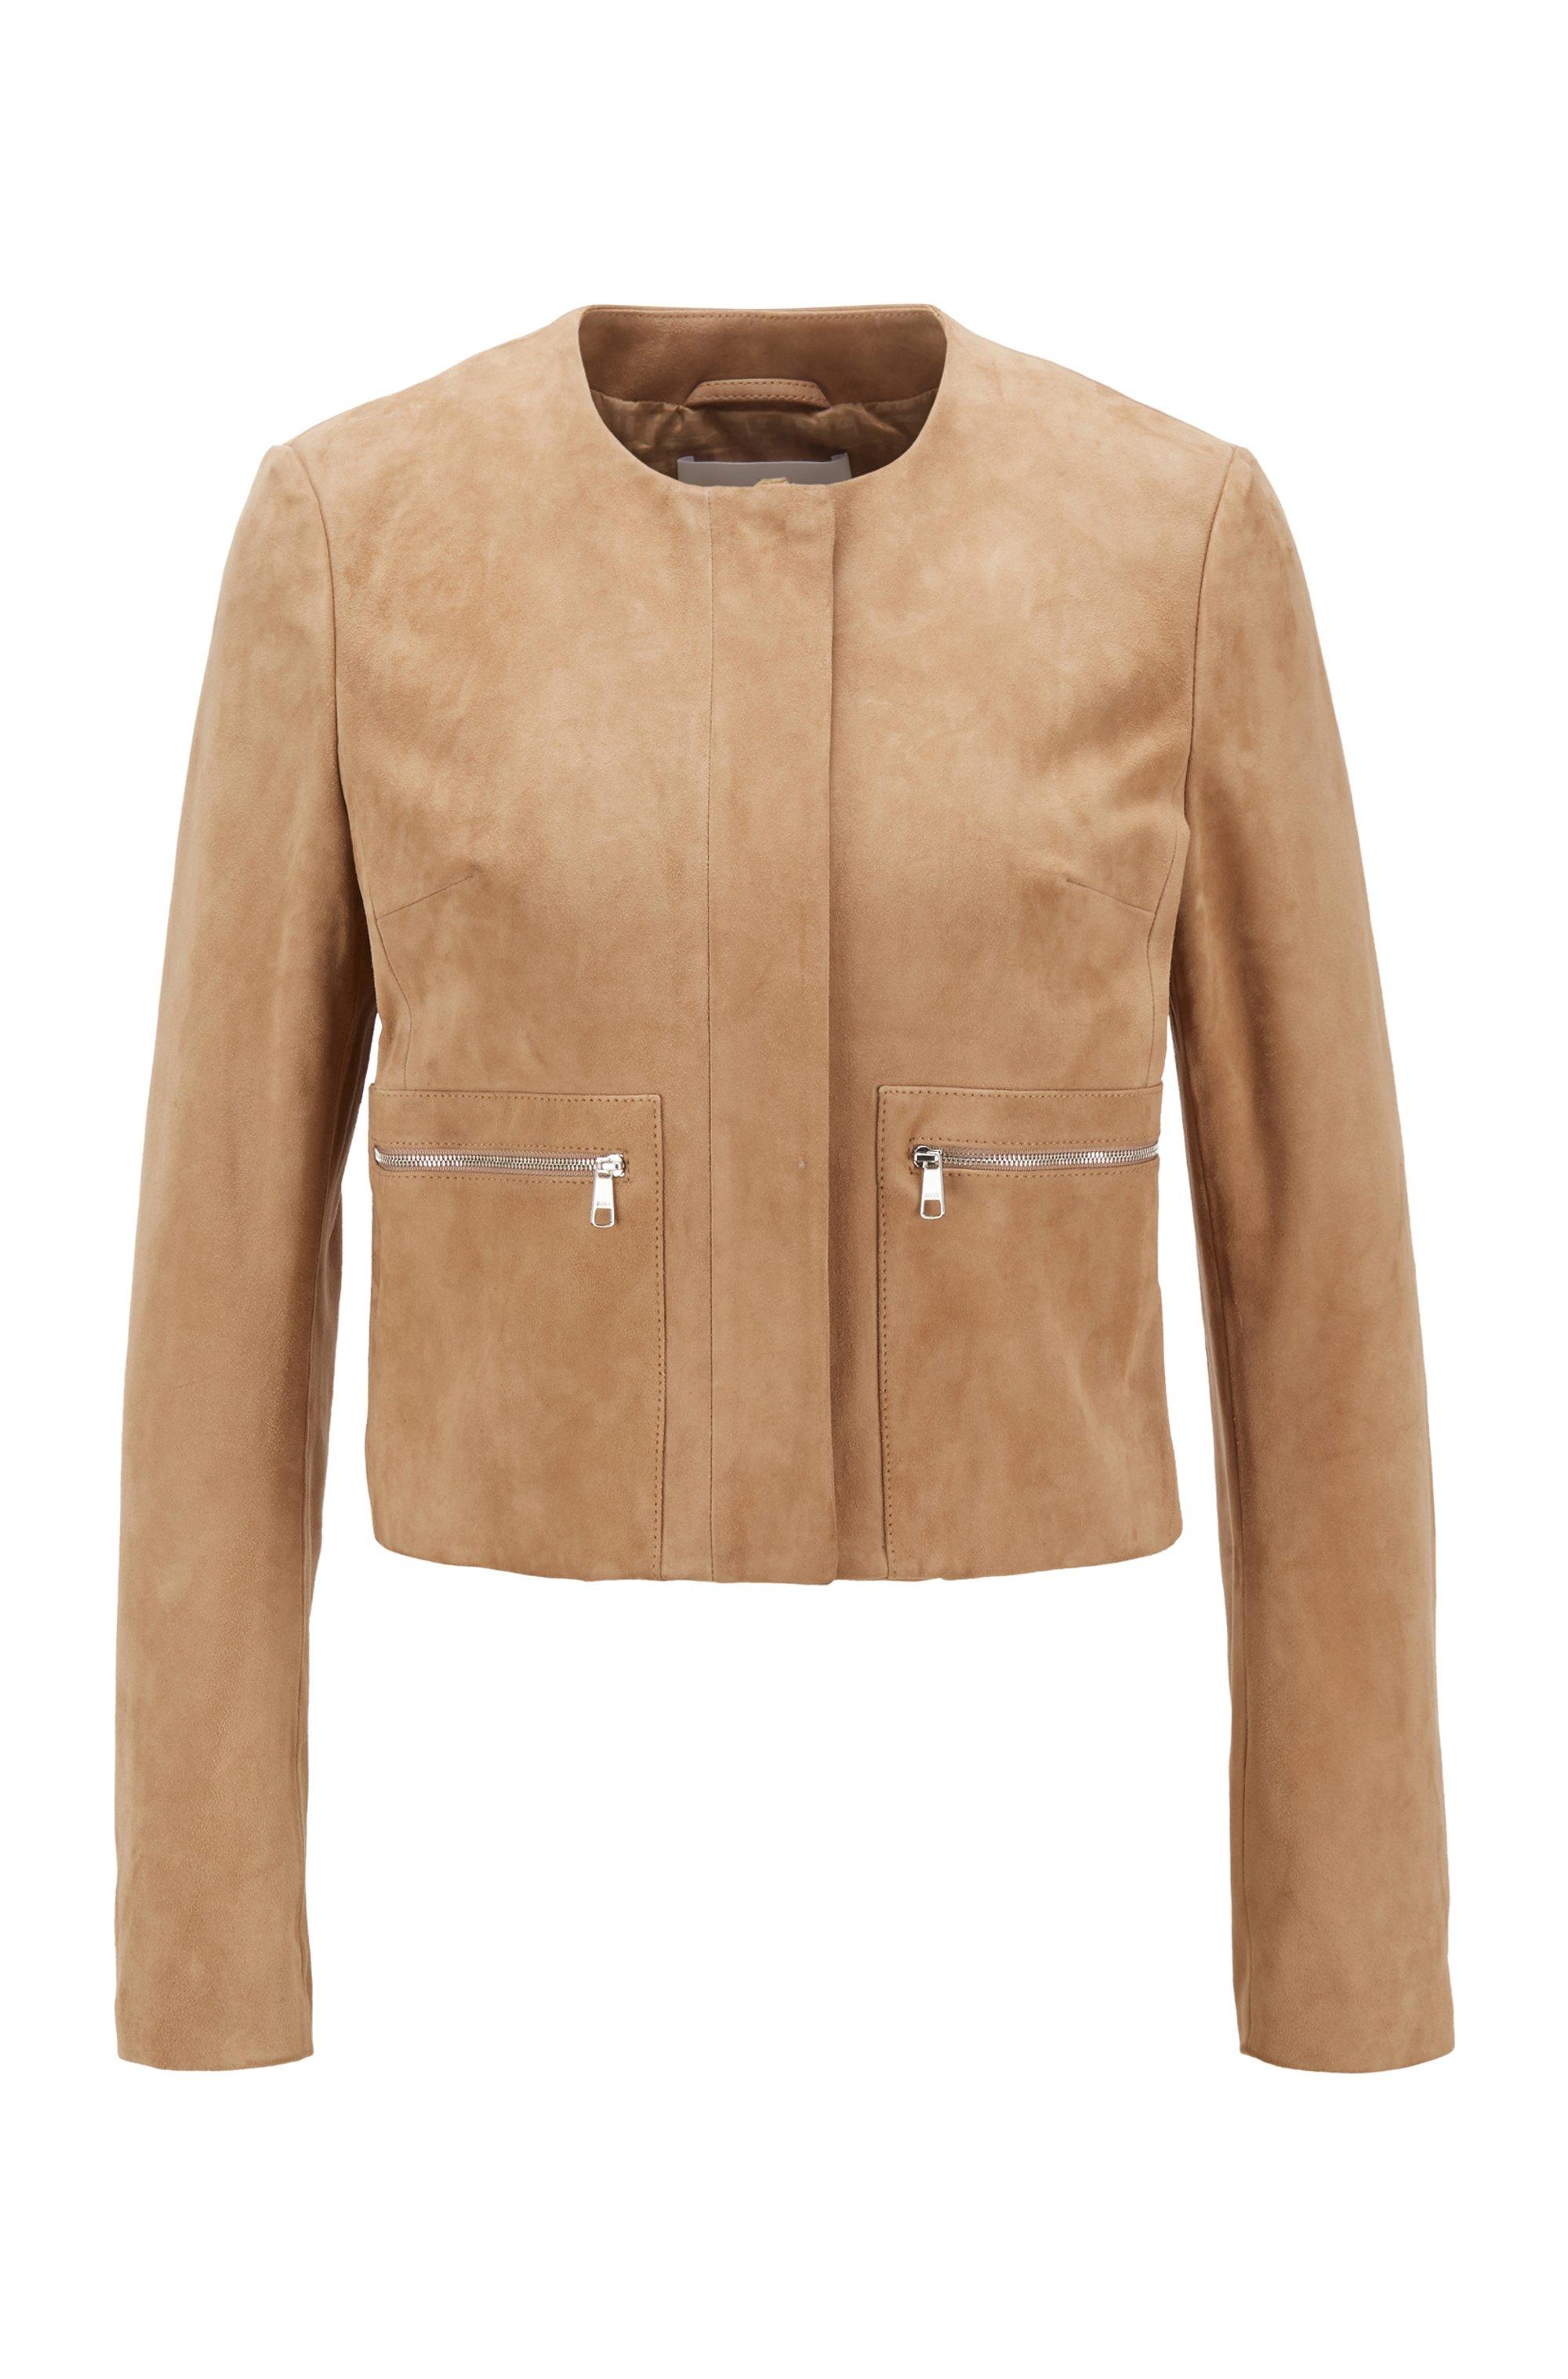 Cropped collarless biker jacket in suede, Brown